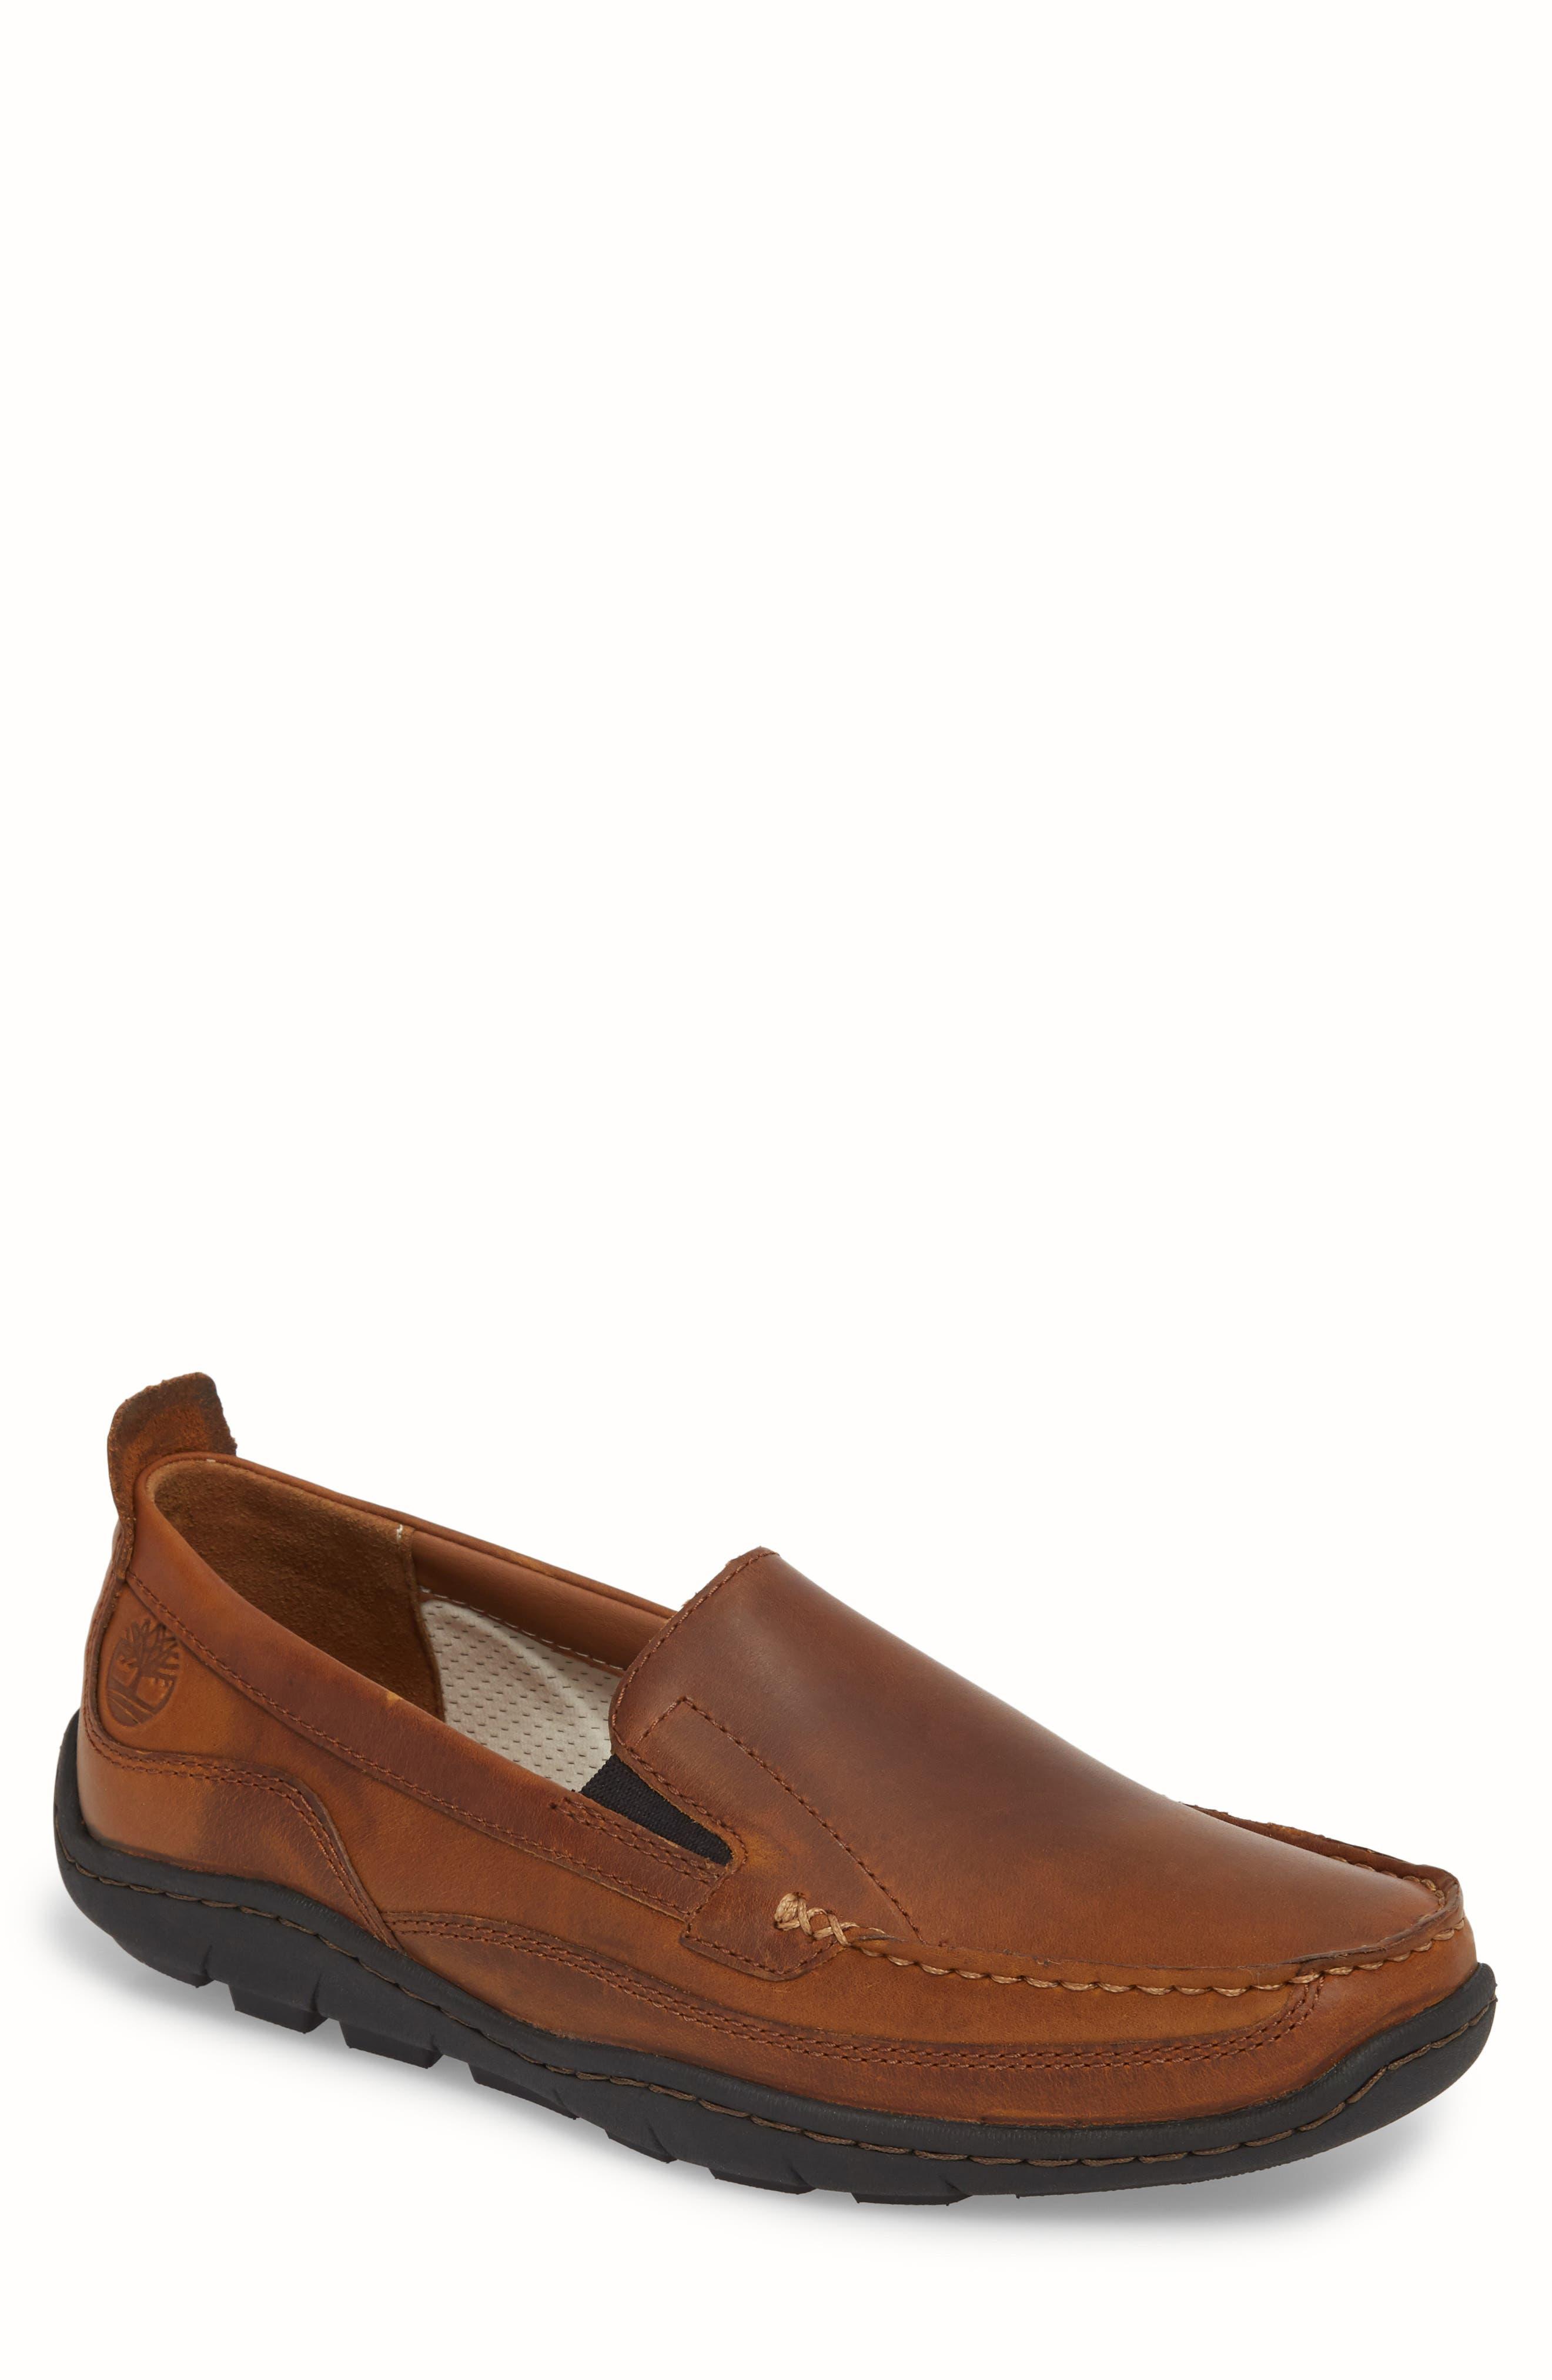 Sandspoint Venetian Loafer,                             Main thumbnail 1, color,                             Tan Old Harness